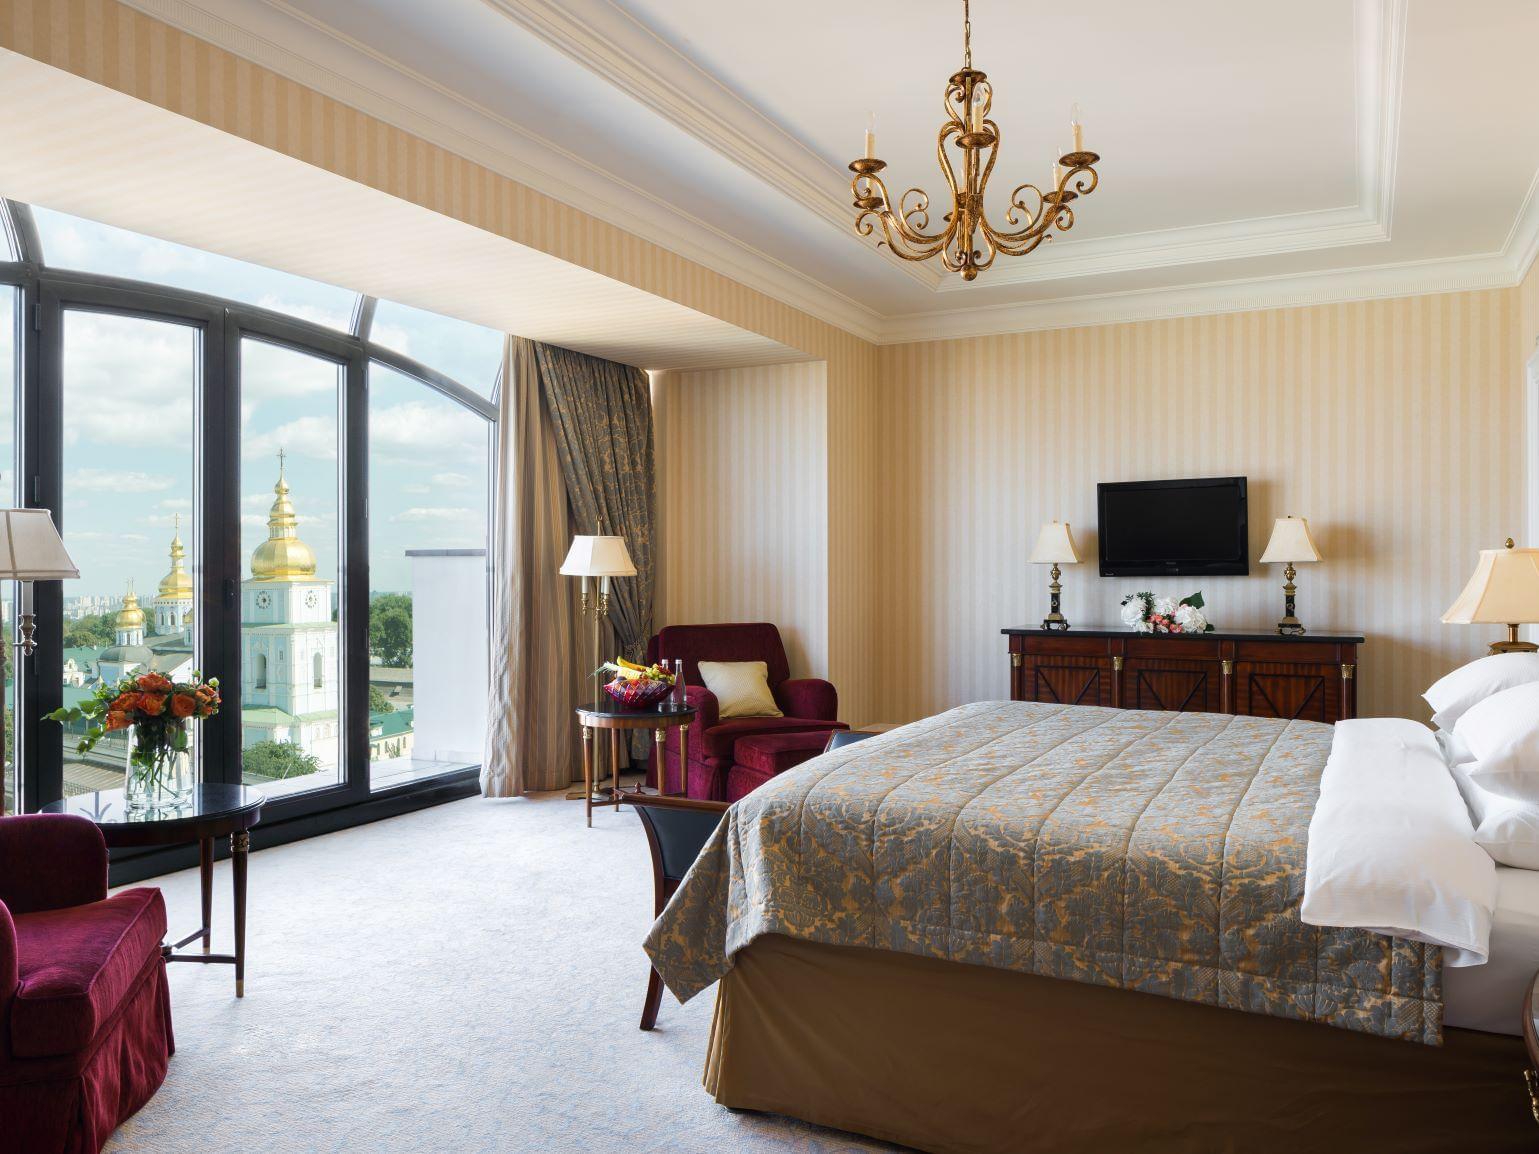 Best Club King Executive  at Intercontinental Kyiv hotel